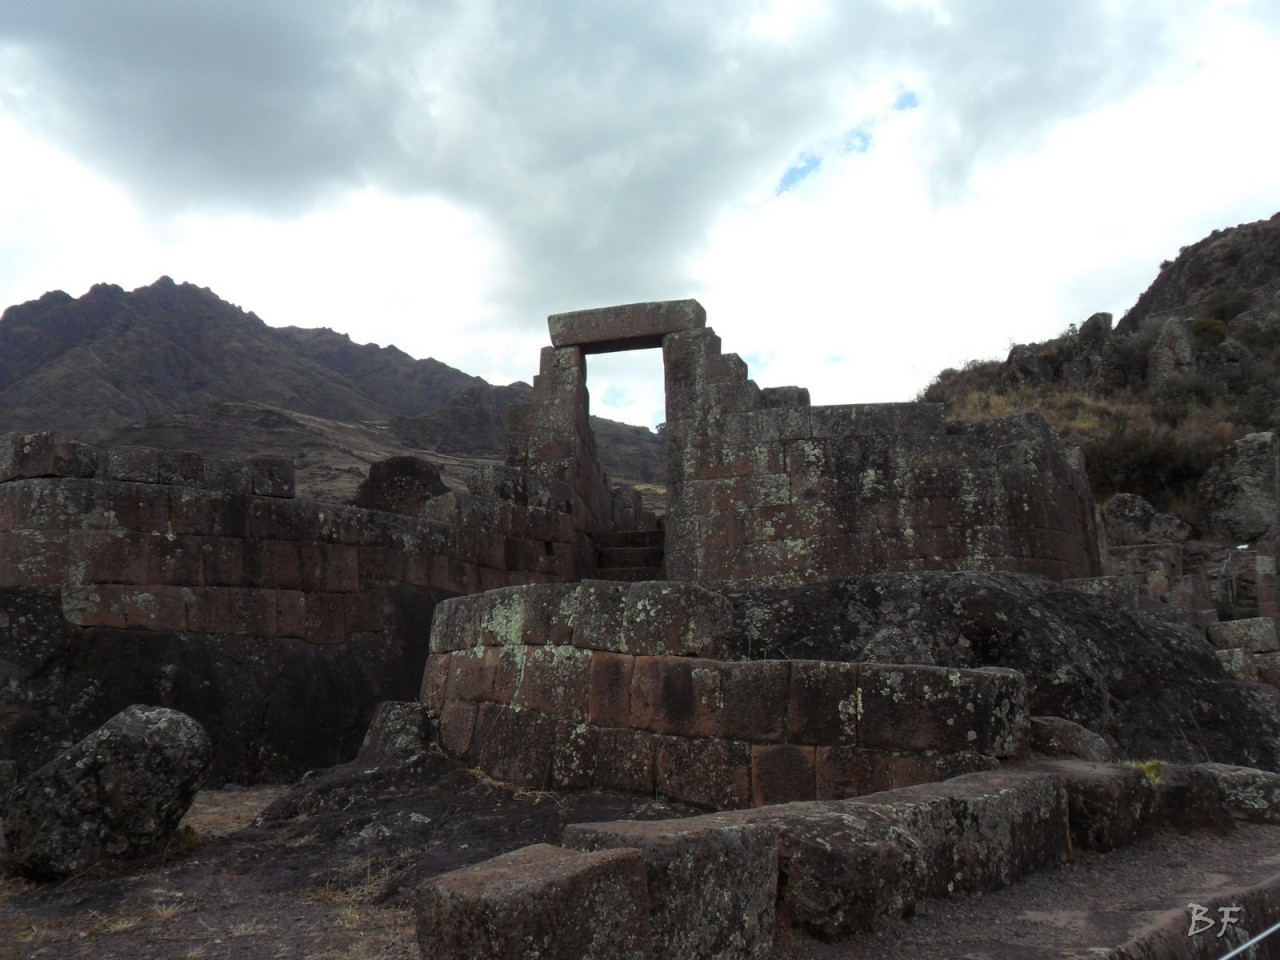 Mura-Poligonali-Megaliti-Altari-Rupestri-Pisac-Cusco-Perù-61